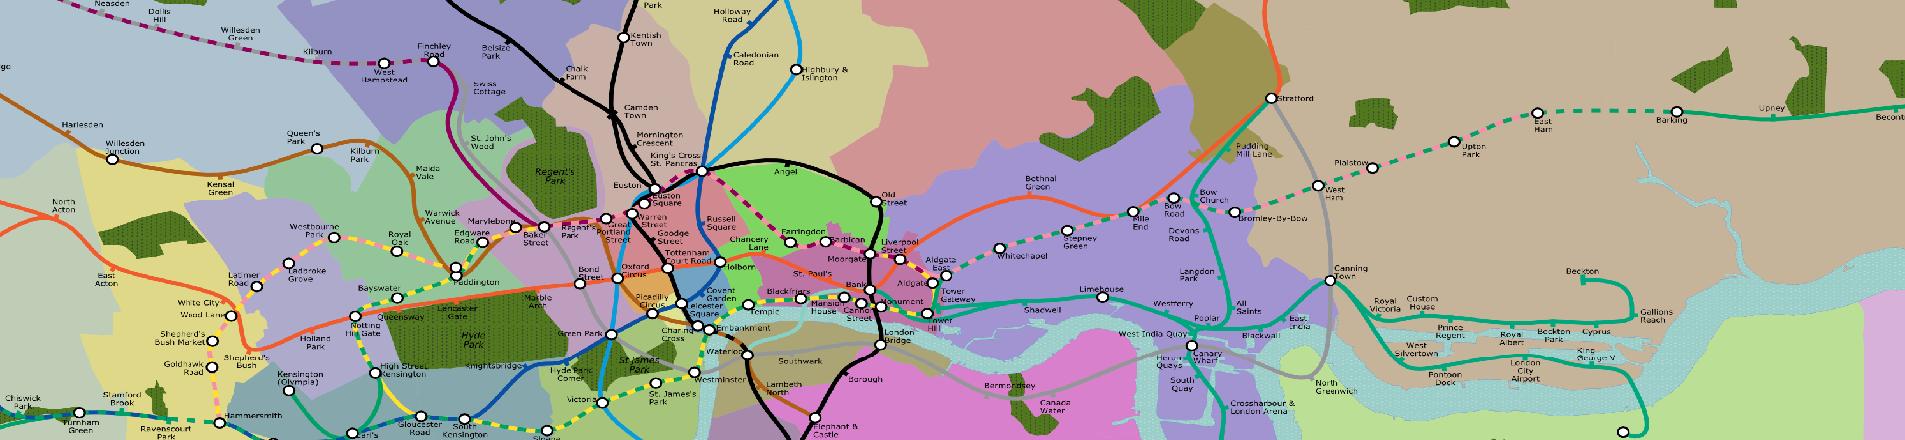 London Underground Map Redesigned to Help Anxious Passengers